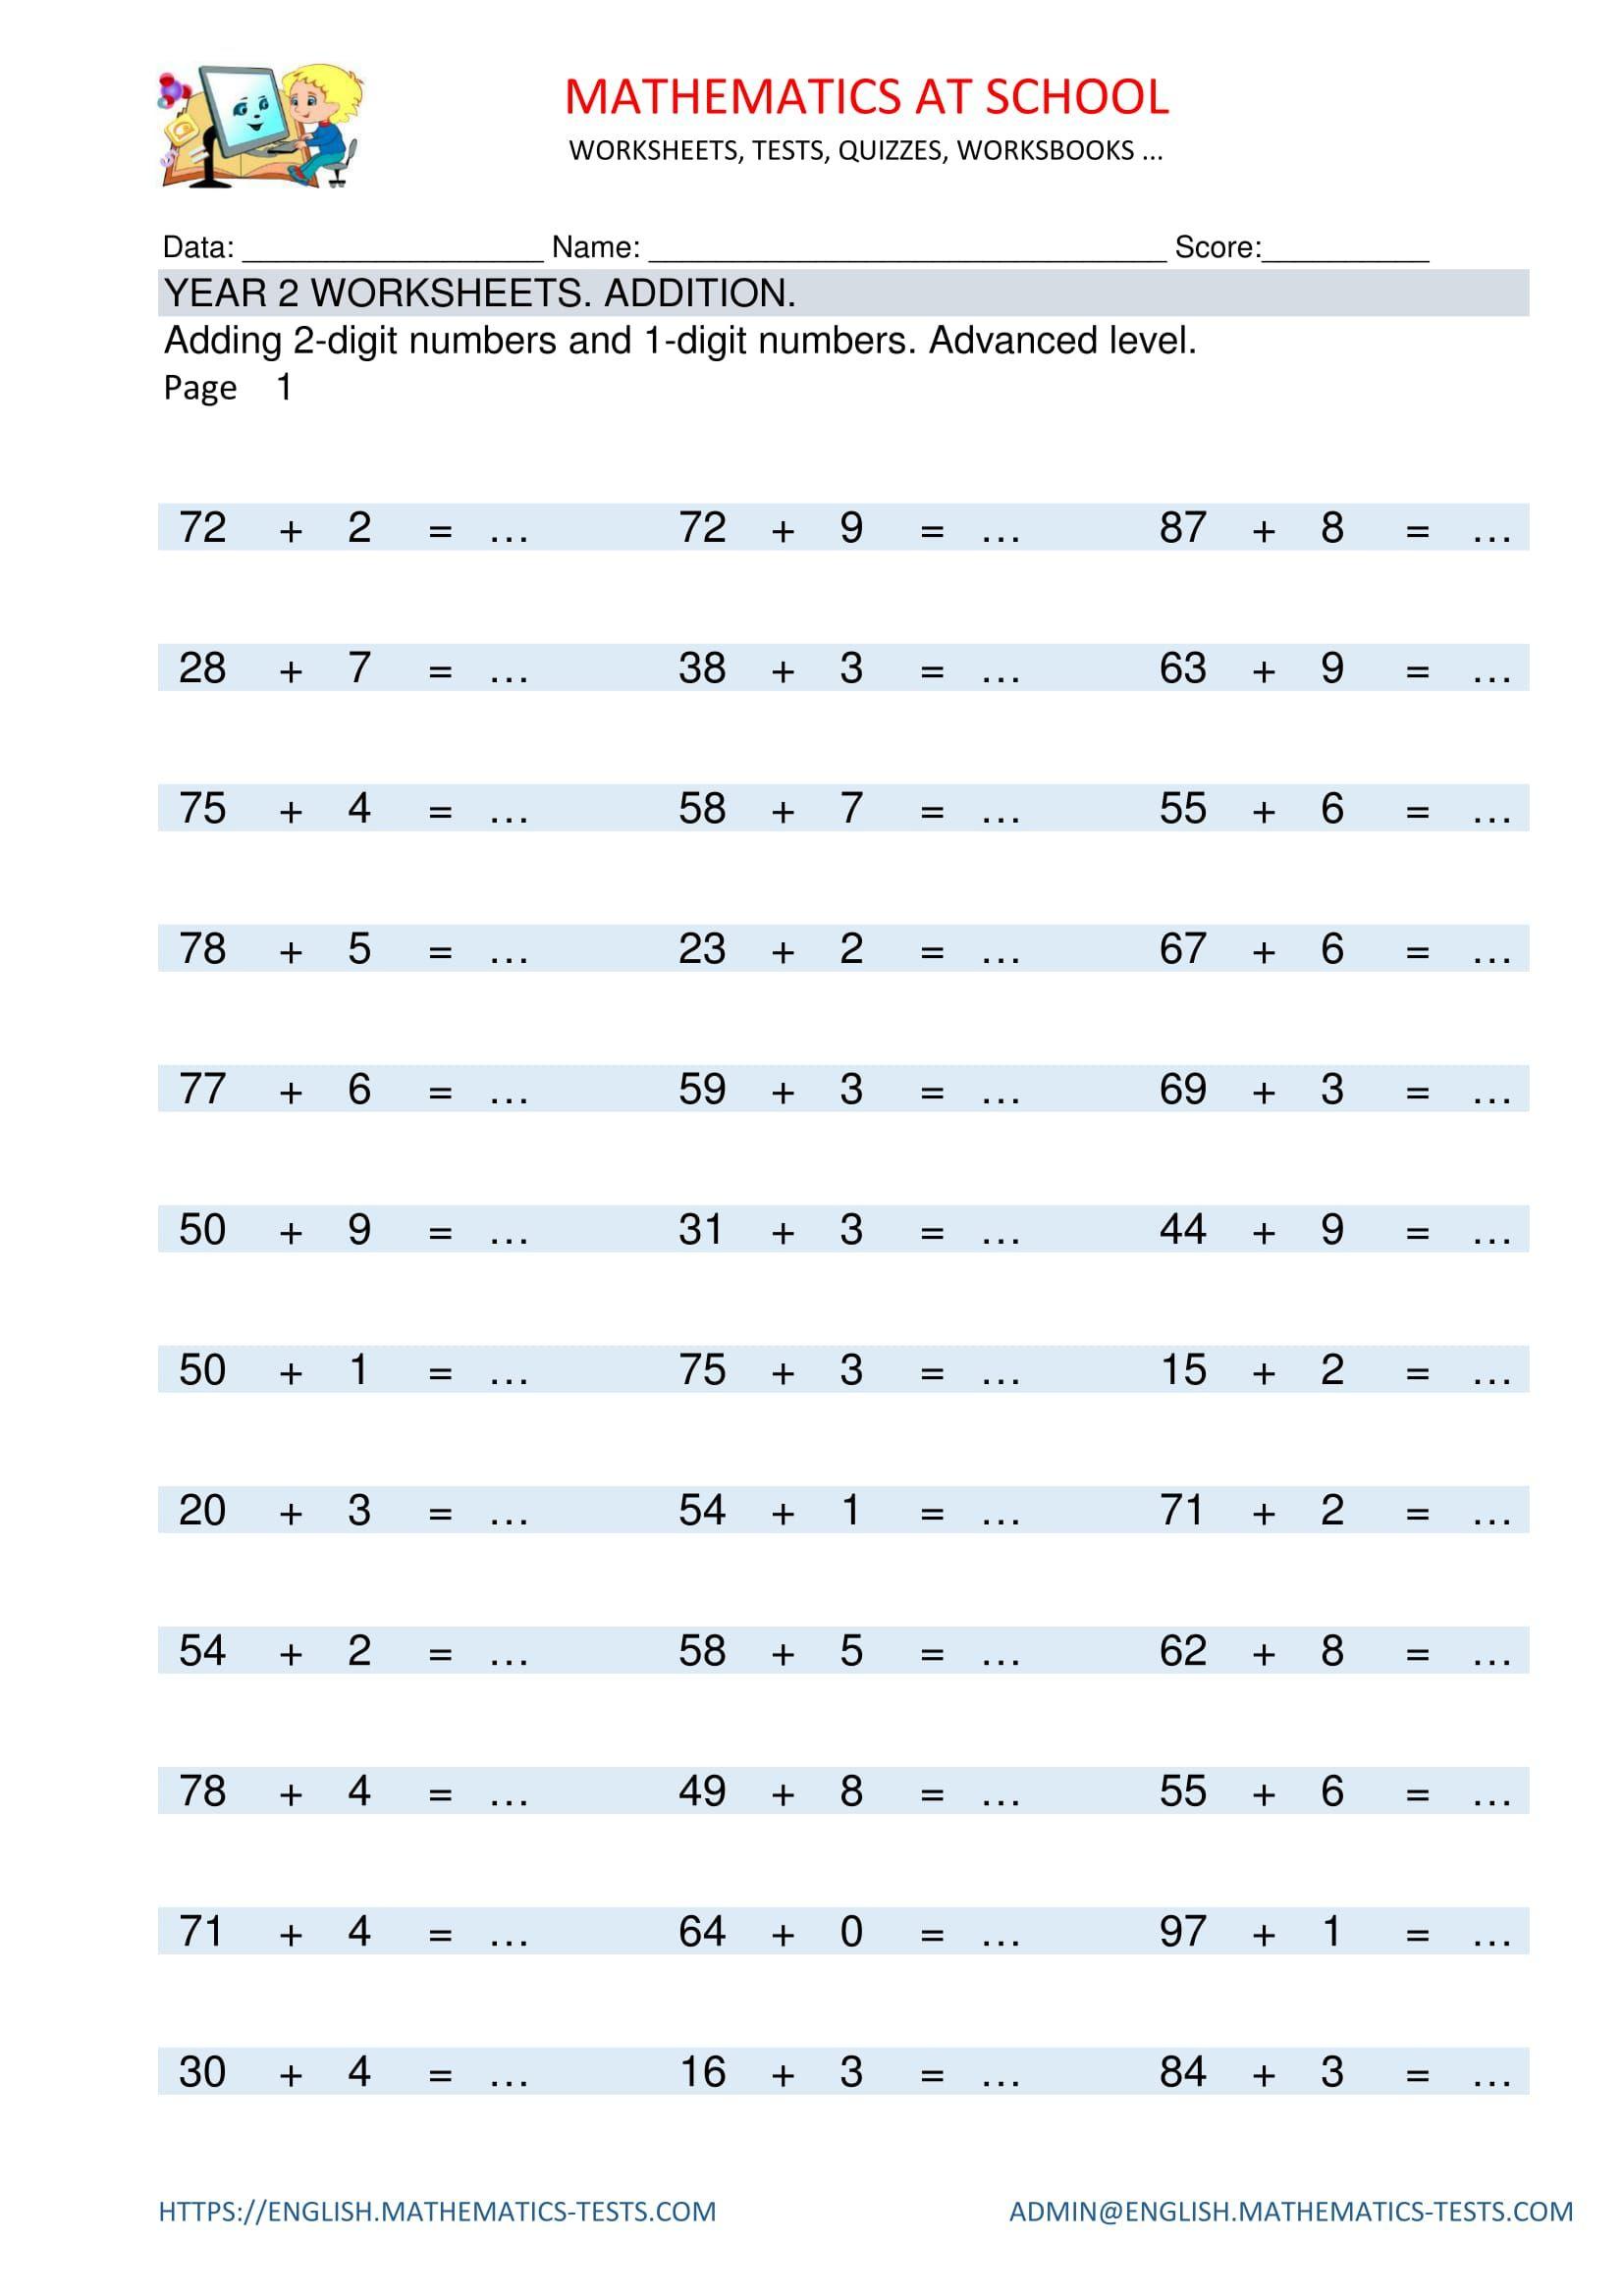 Pinenglish Maths On Year 2 Maths Worksheets And Free Printable | Free Printable English Worksheets For 3Rd Grade